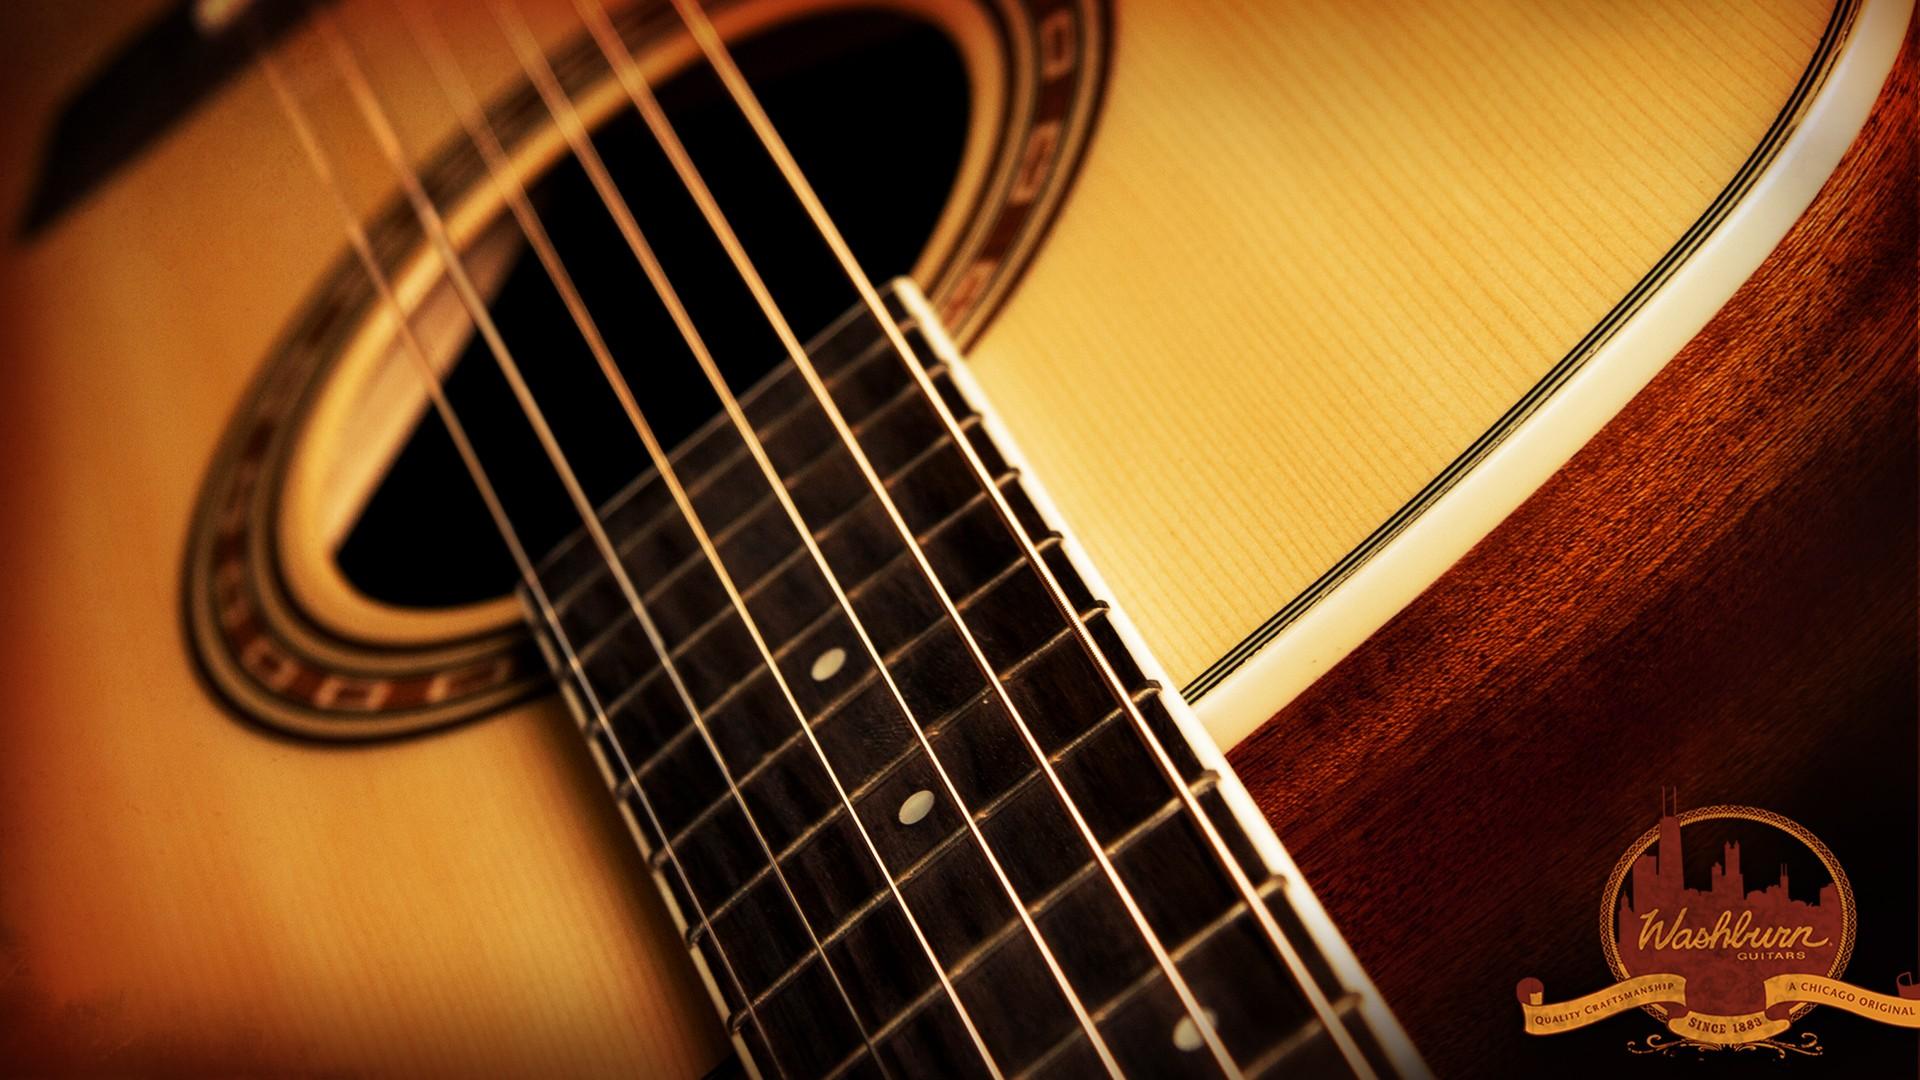 1920x1080 Washburn Guitars Wallpaper · Download · Acoustic ...